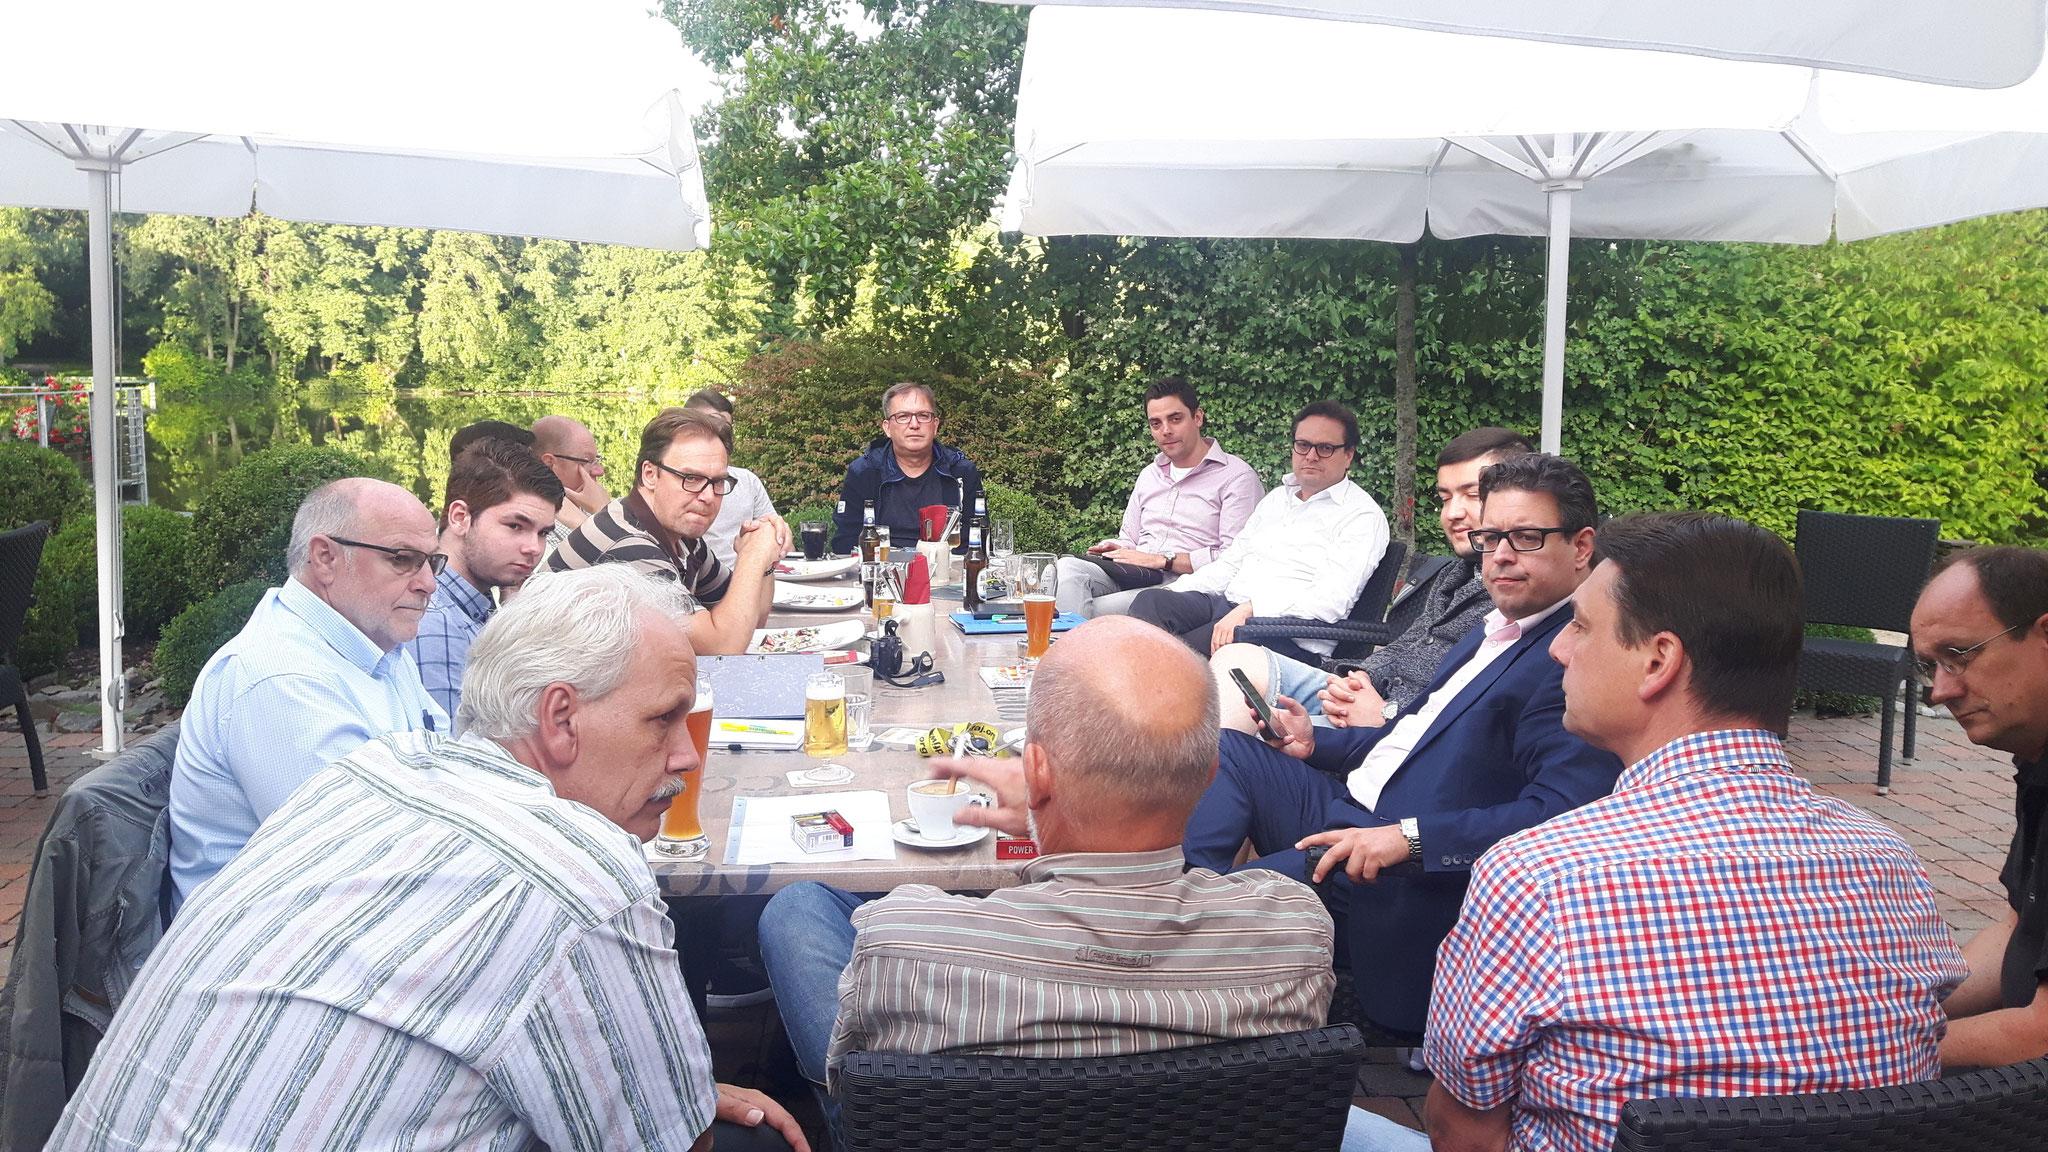 Wahlkampf-Besprechung während der Bundestagswahl 2017